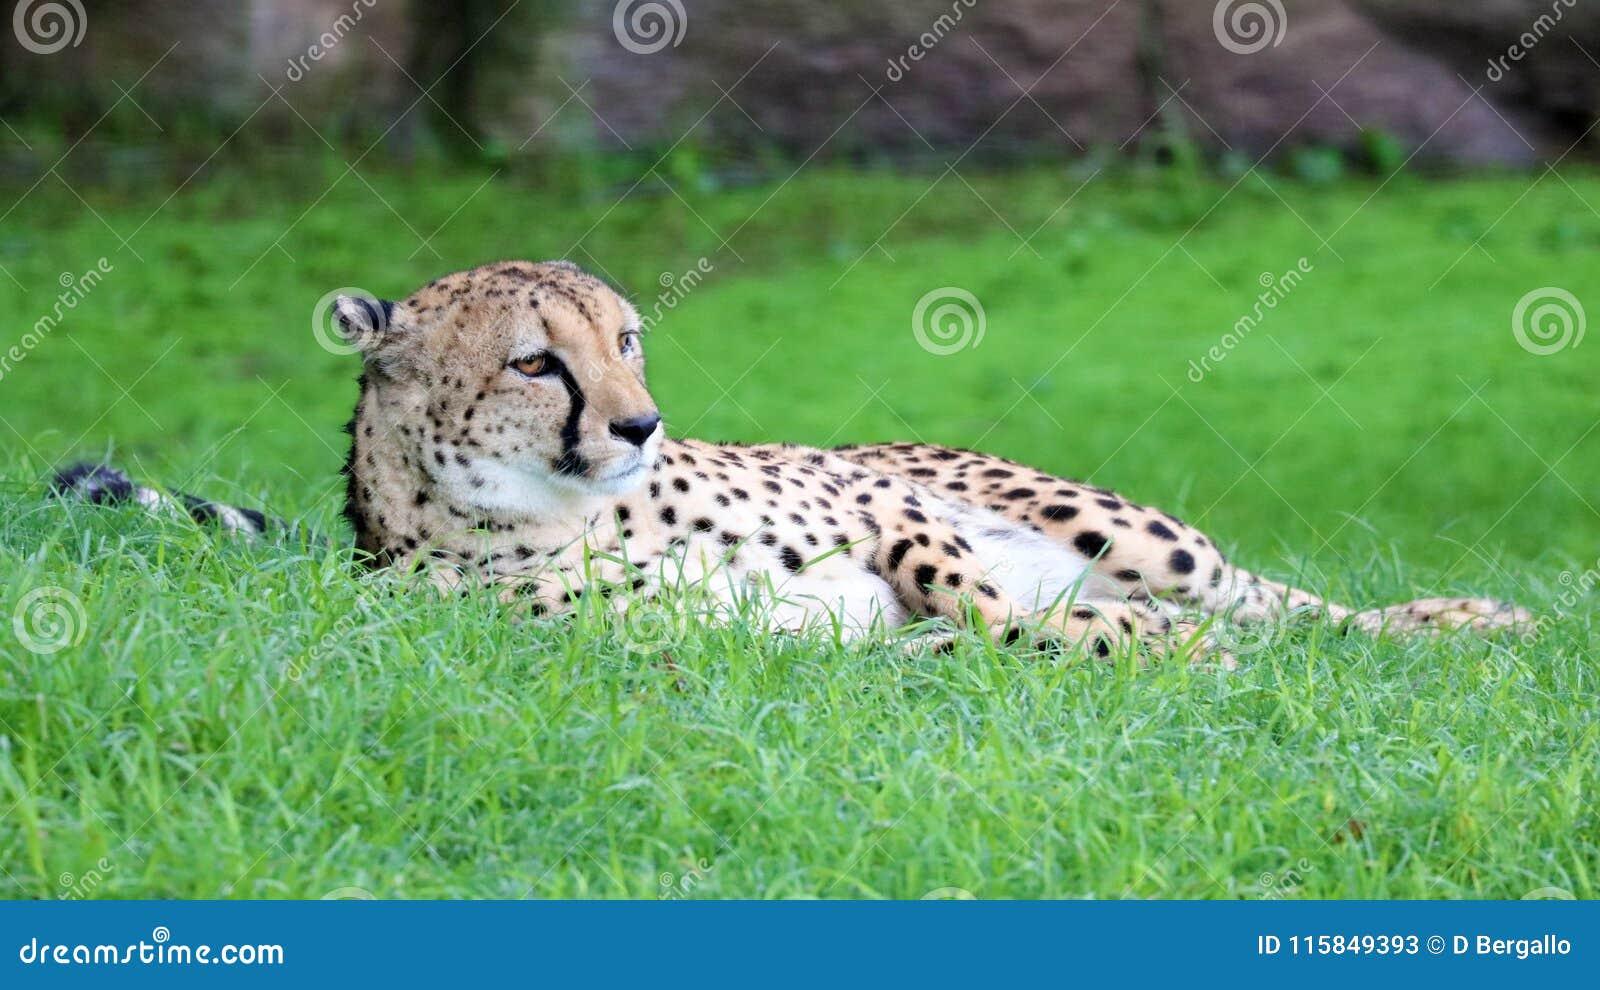 Unique Cheetah In A Green Grass Hill High Definition Photo